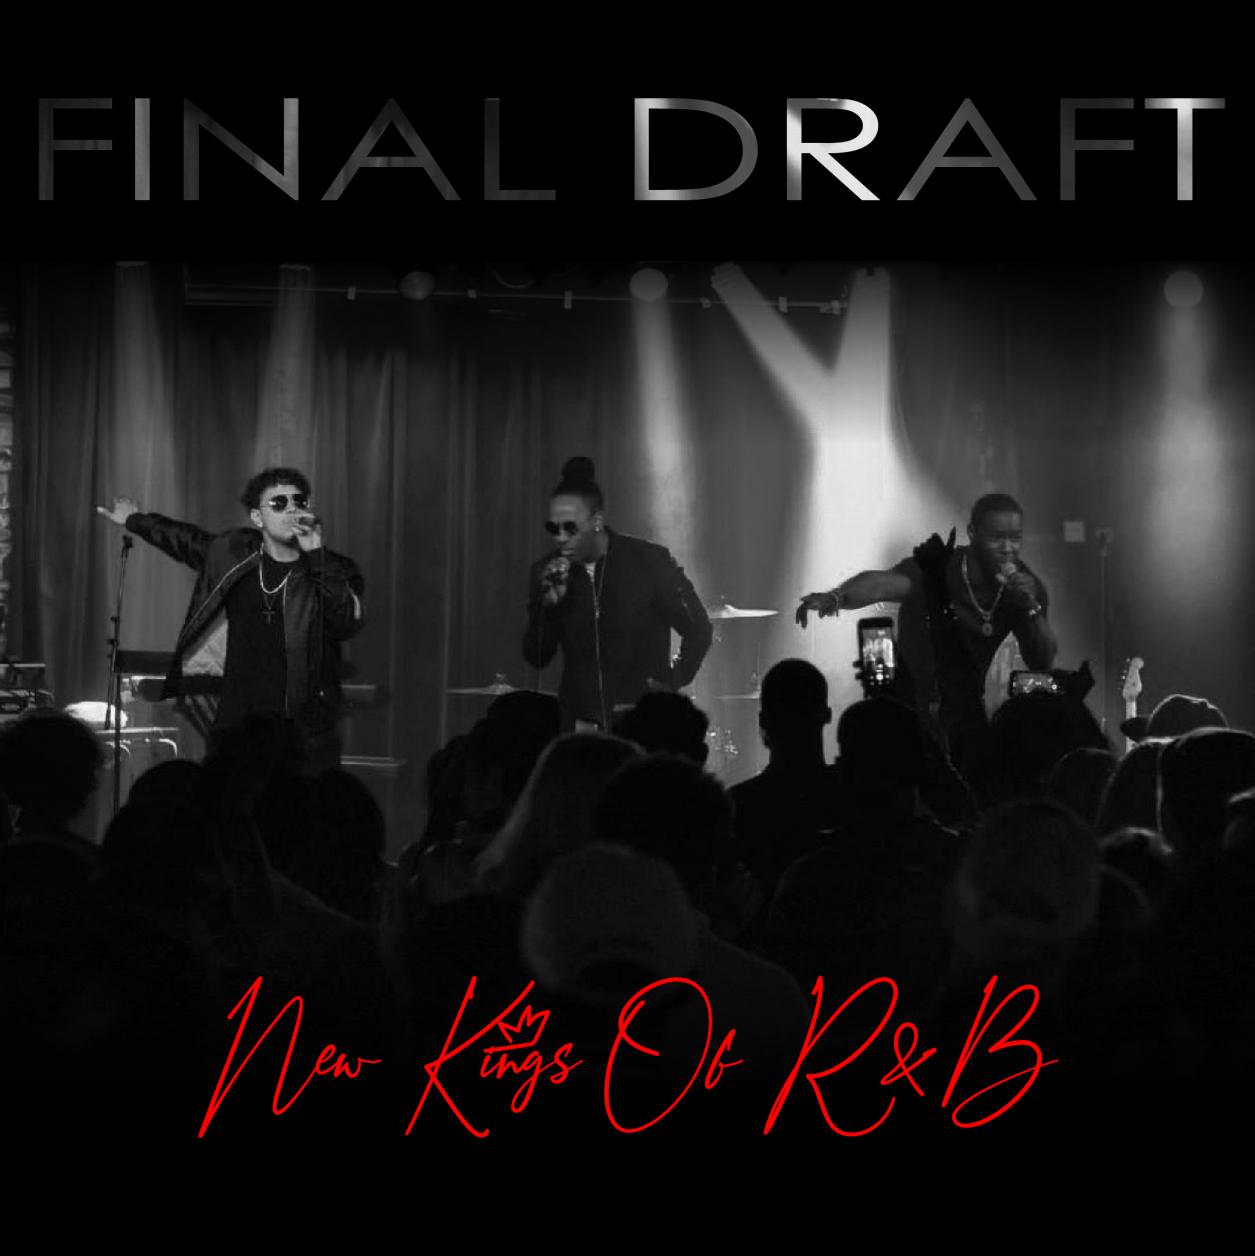 Final Draft New Kings Of R&B Cover Art